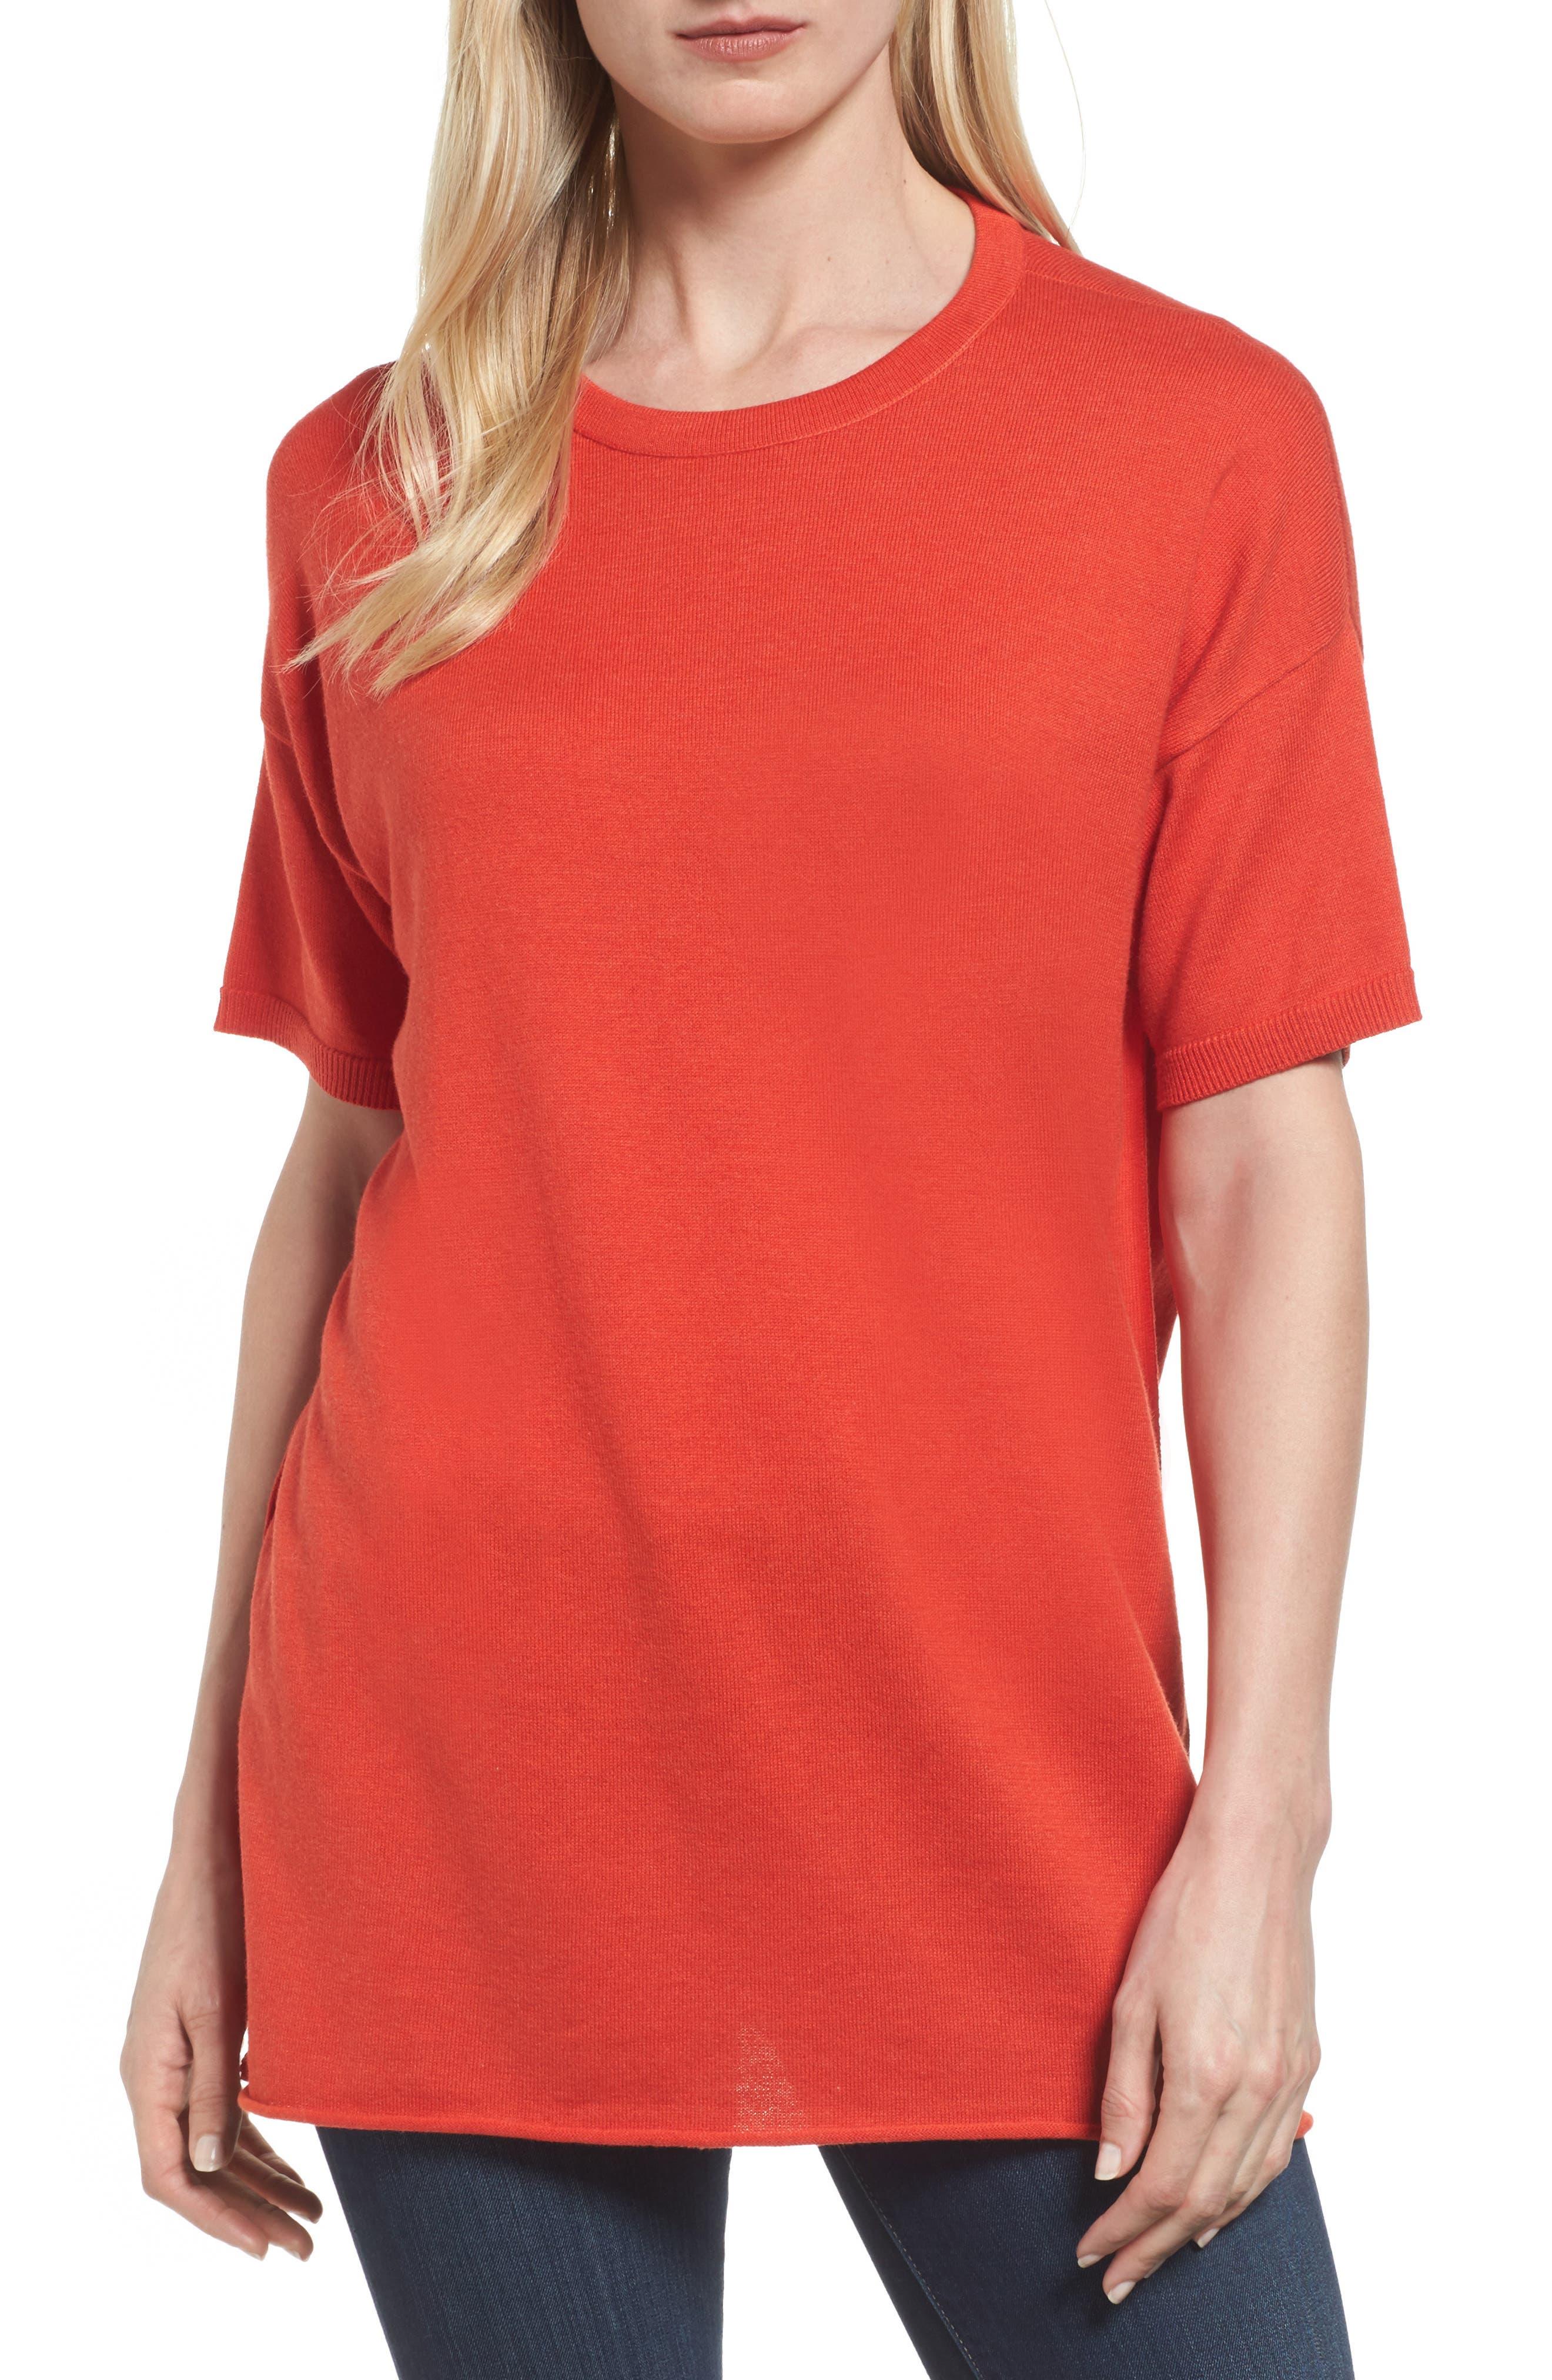 Eileen Fisher Organic Cotton Top